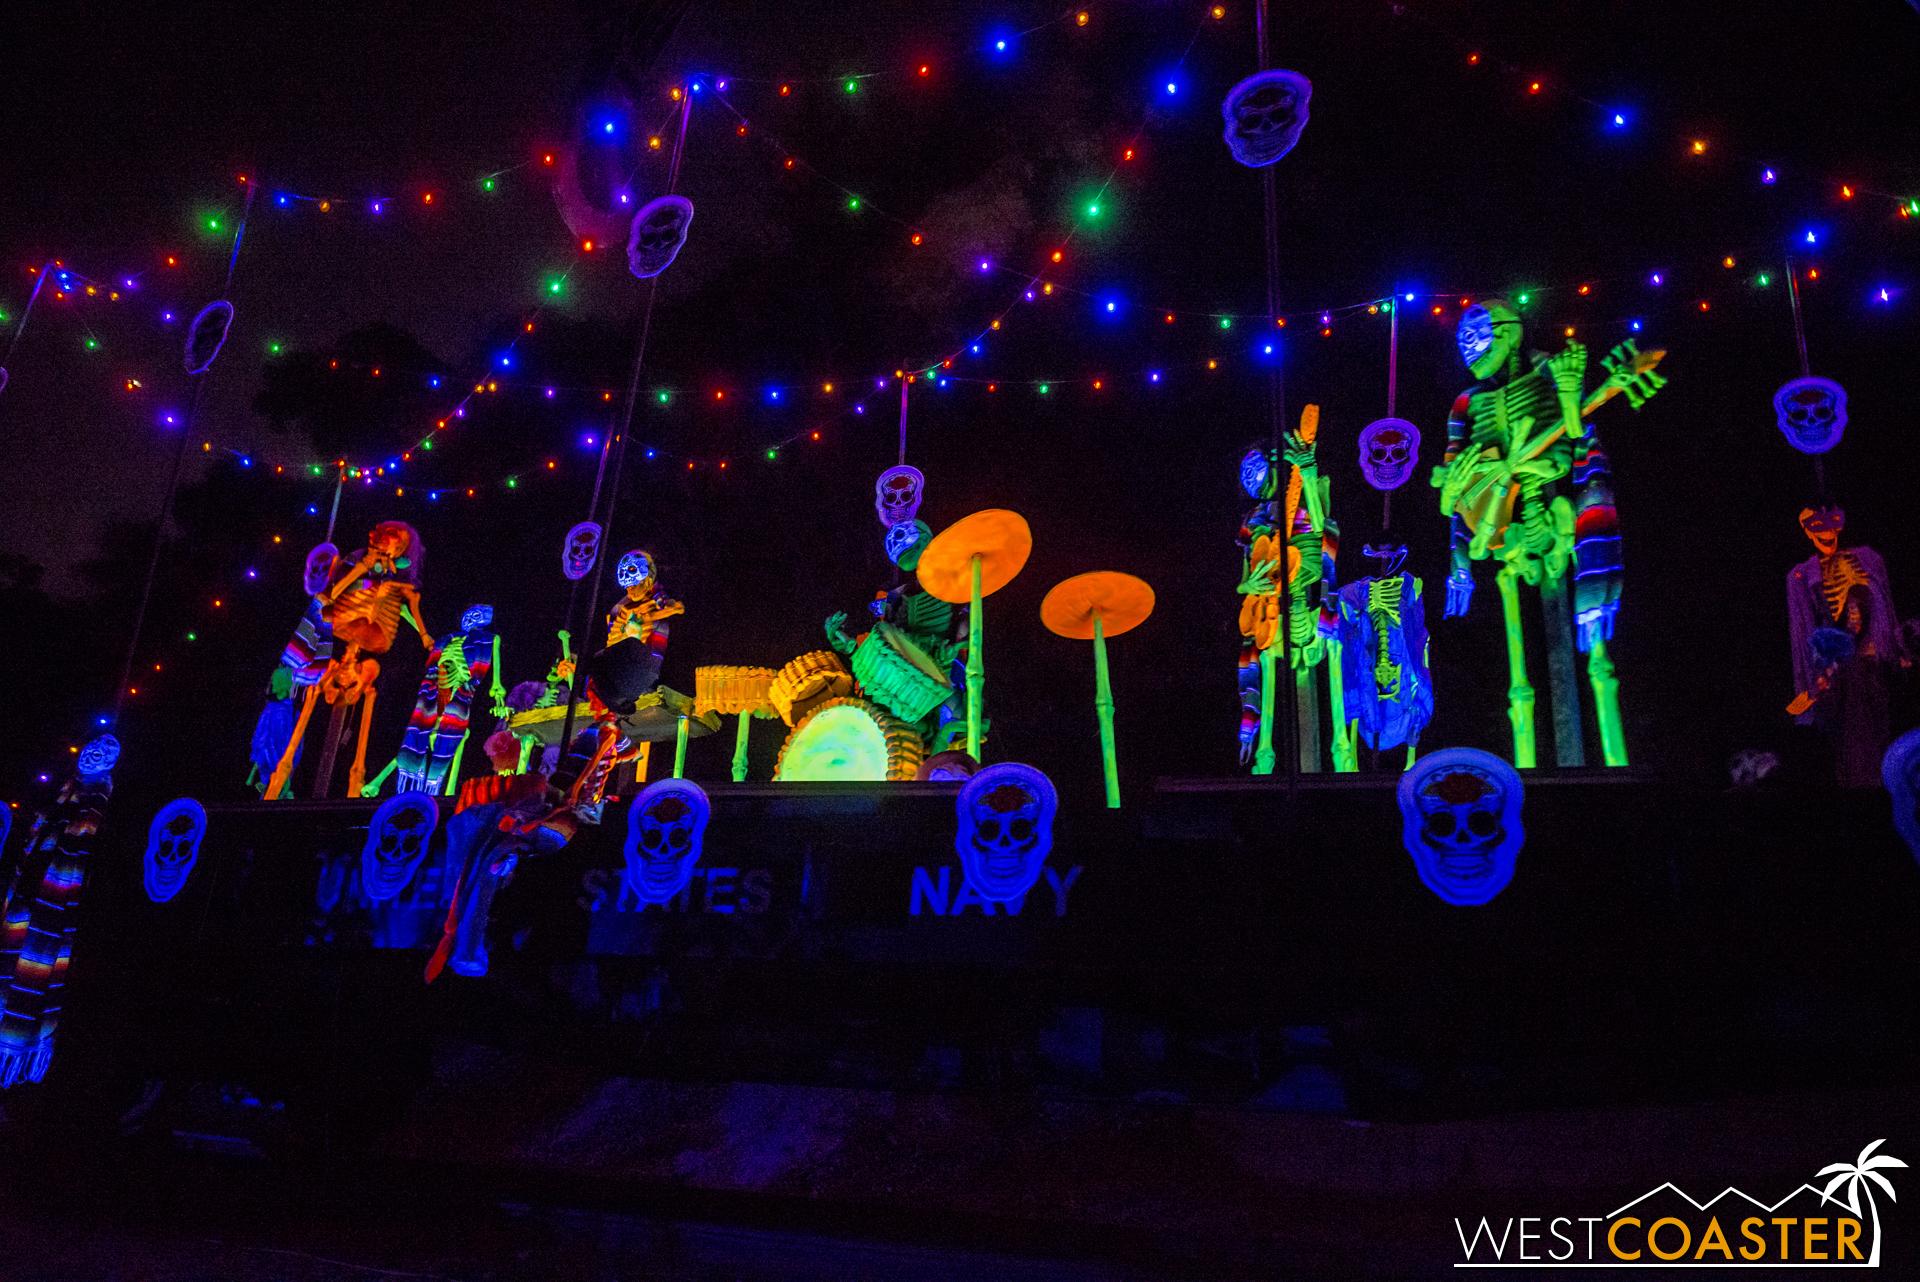 A fun Día de los Muertos scenes celebrates the Mexican ritual holiday that comes right after Halloween.